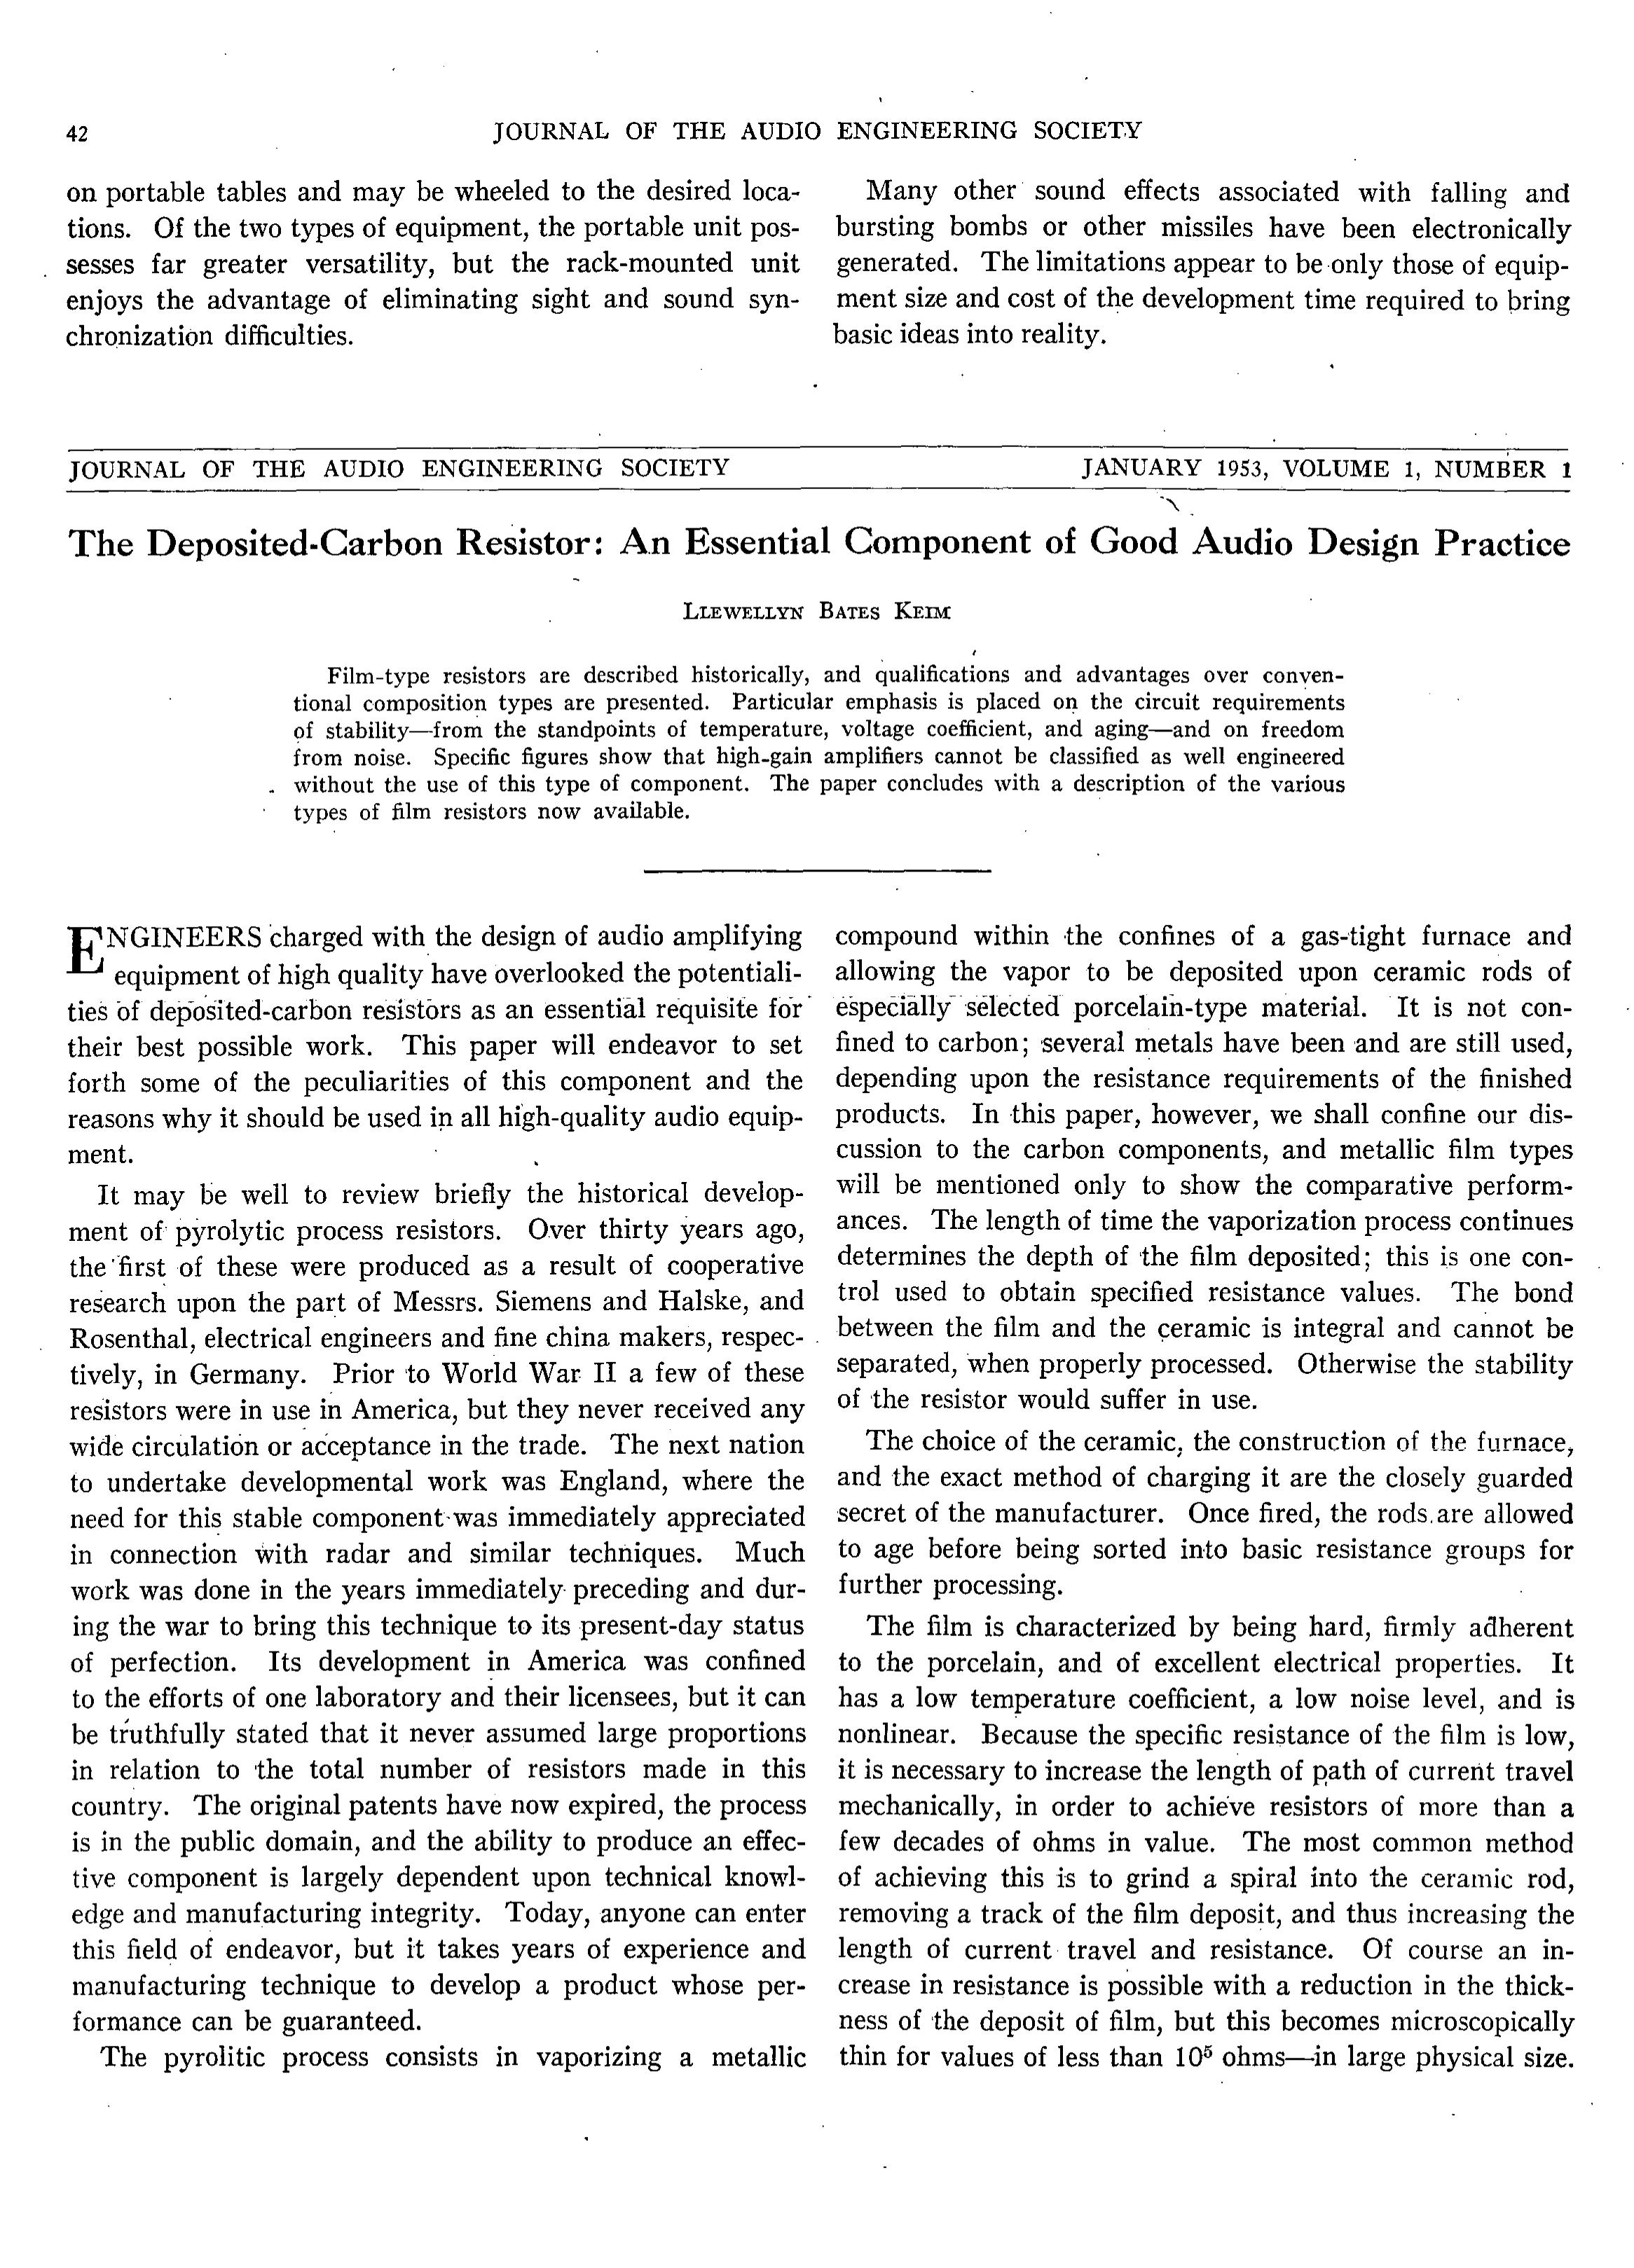 AES ELibrary The DepositedCarbon Resistor An Essential - Audio design document